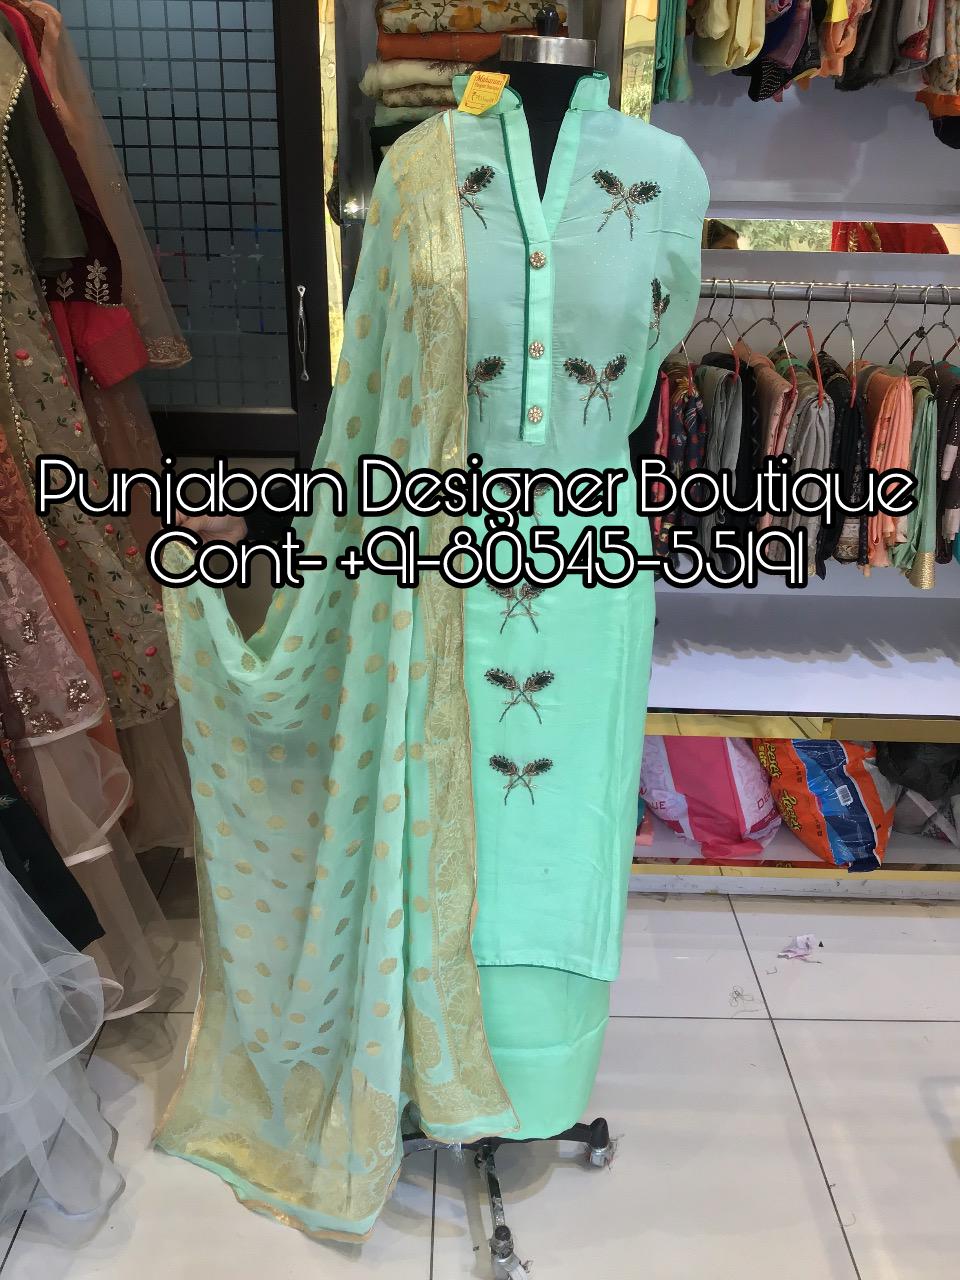 Punjabi Suit Embroidery Boutique Punjaban Designer Boutique